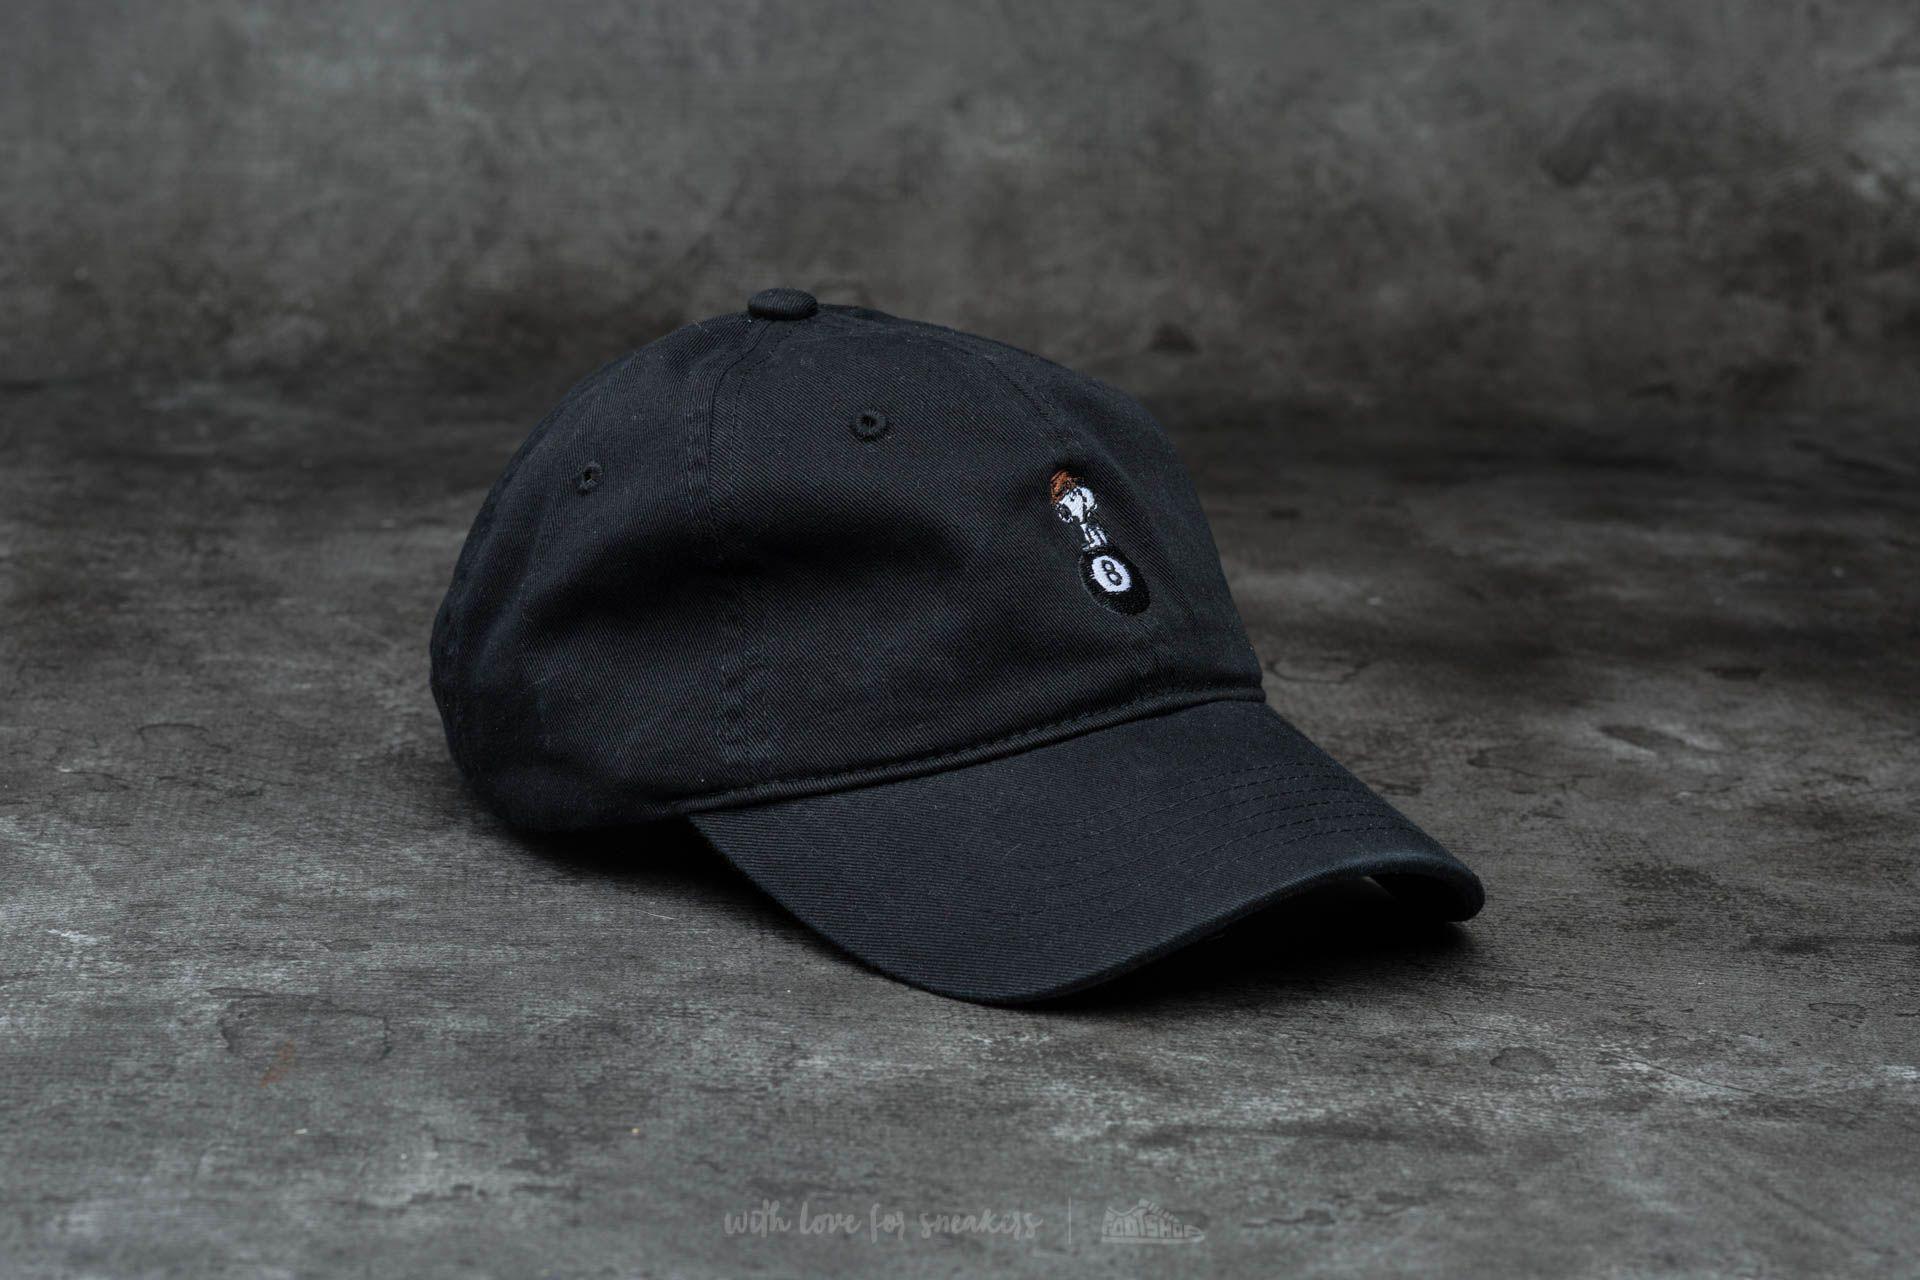 d2d8466b638 HUF Apparel Spike 8 Ball Curve Brim Cap Black